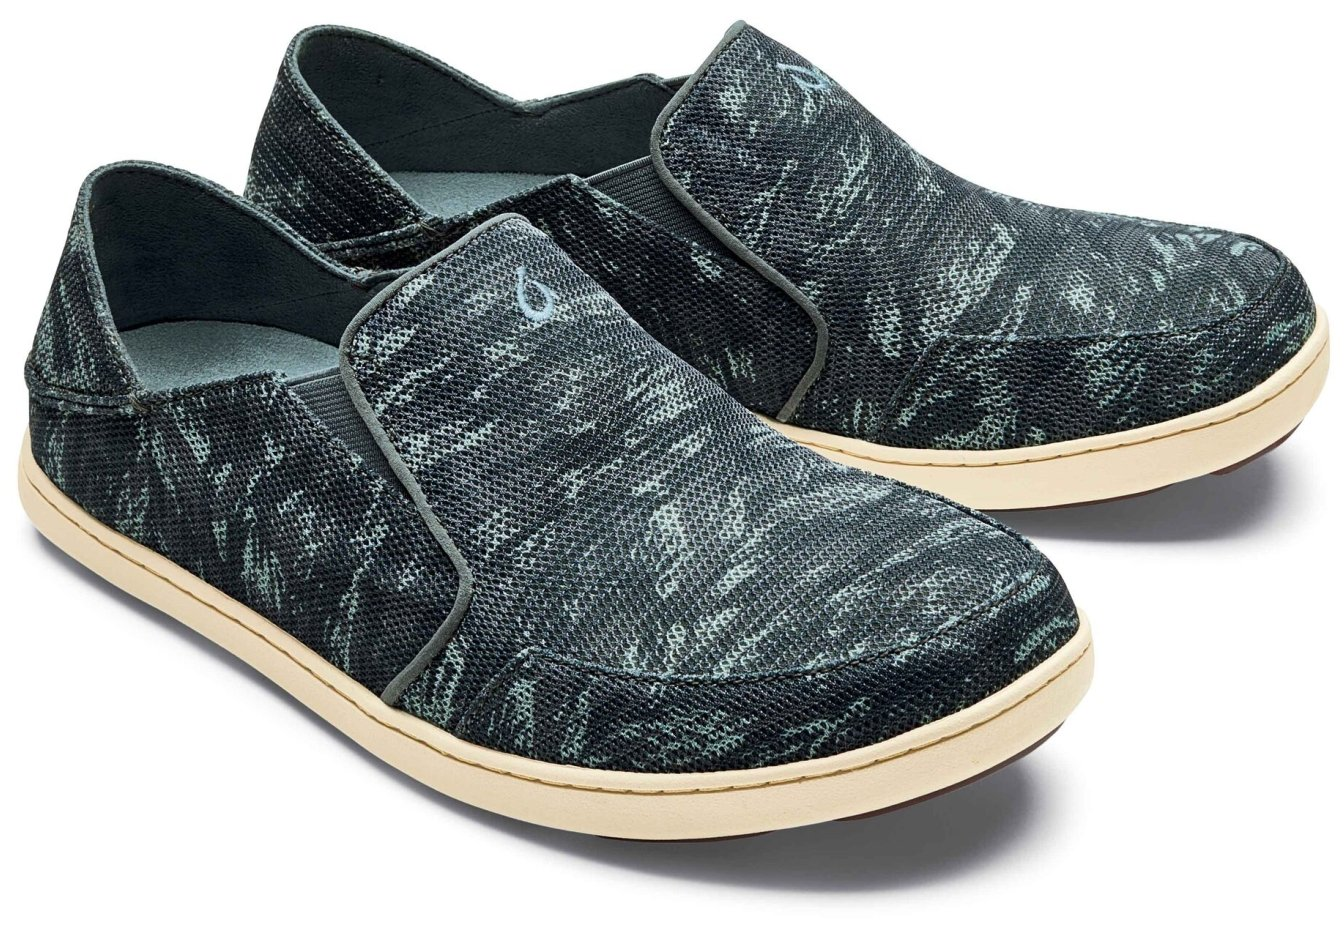 OLUKAI Nohea Mesh Shoe - Men's B073C4D49M 7 D(M) US|Charcoal/Dive Camo